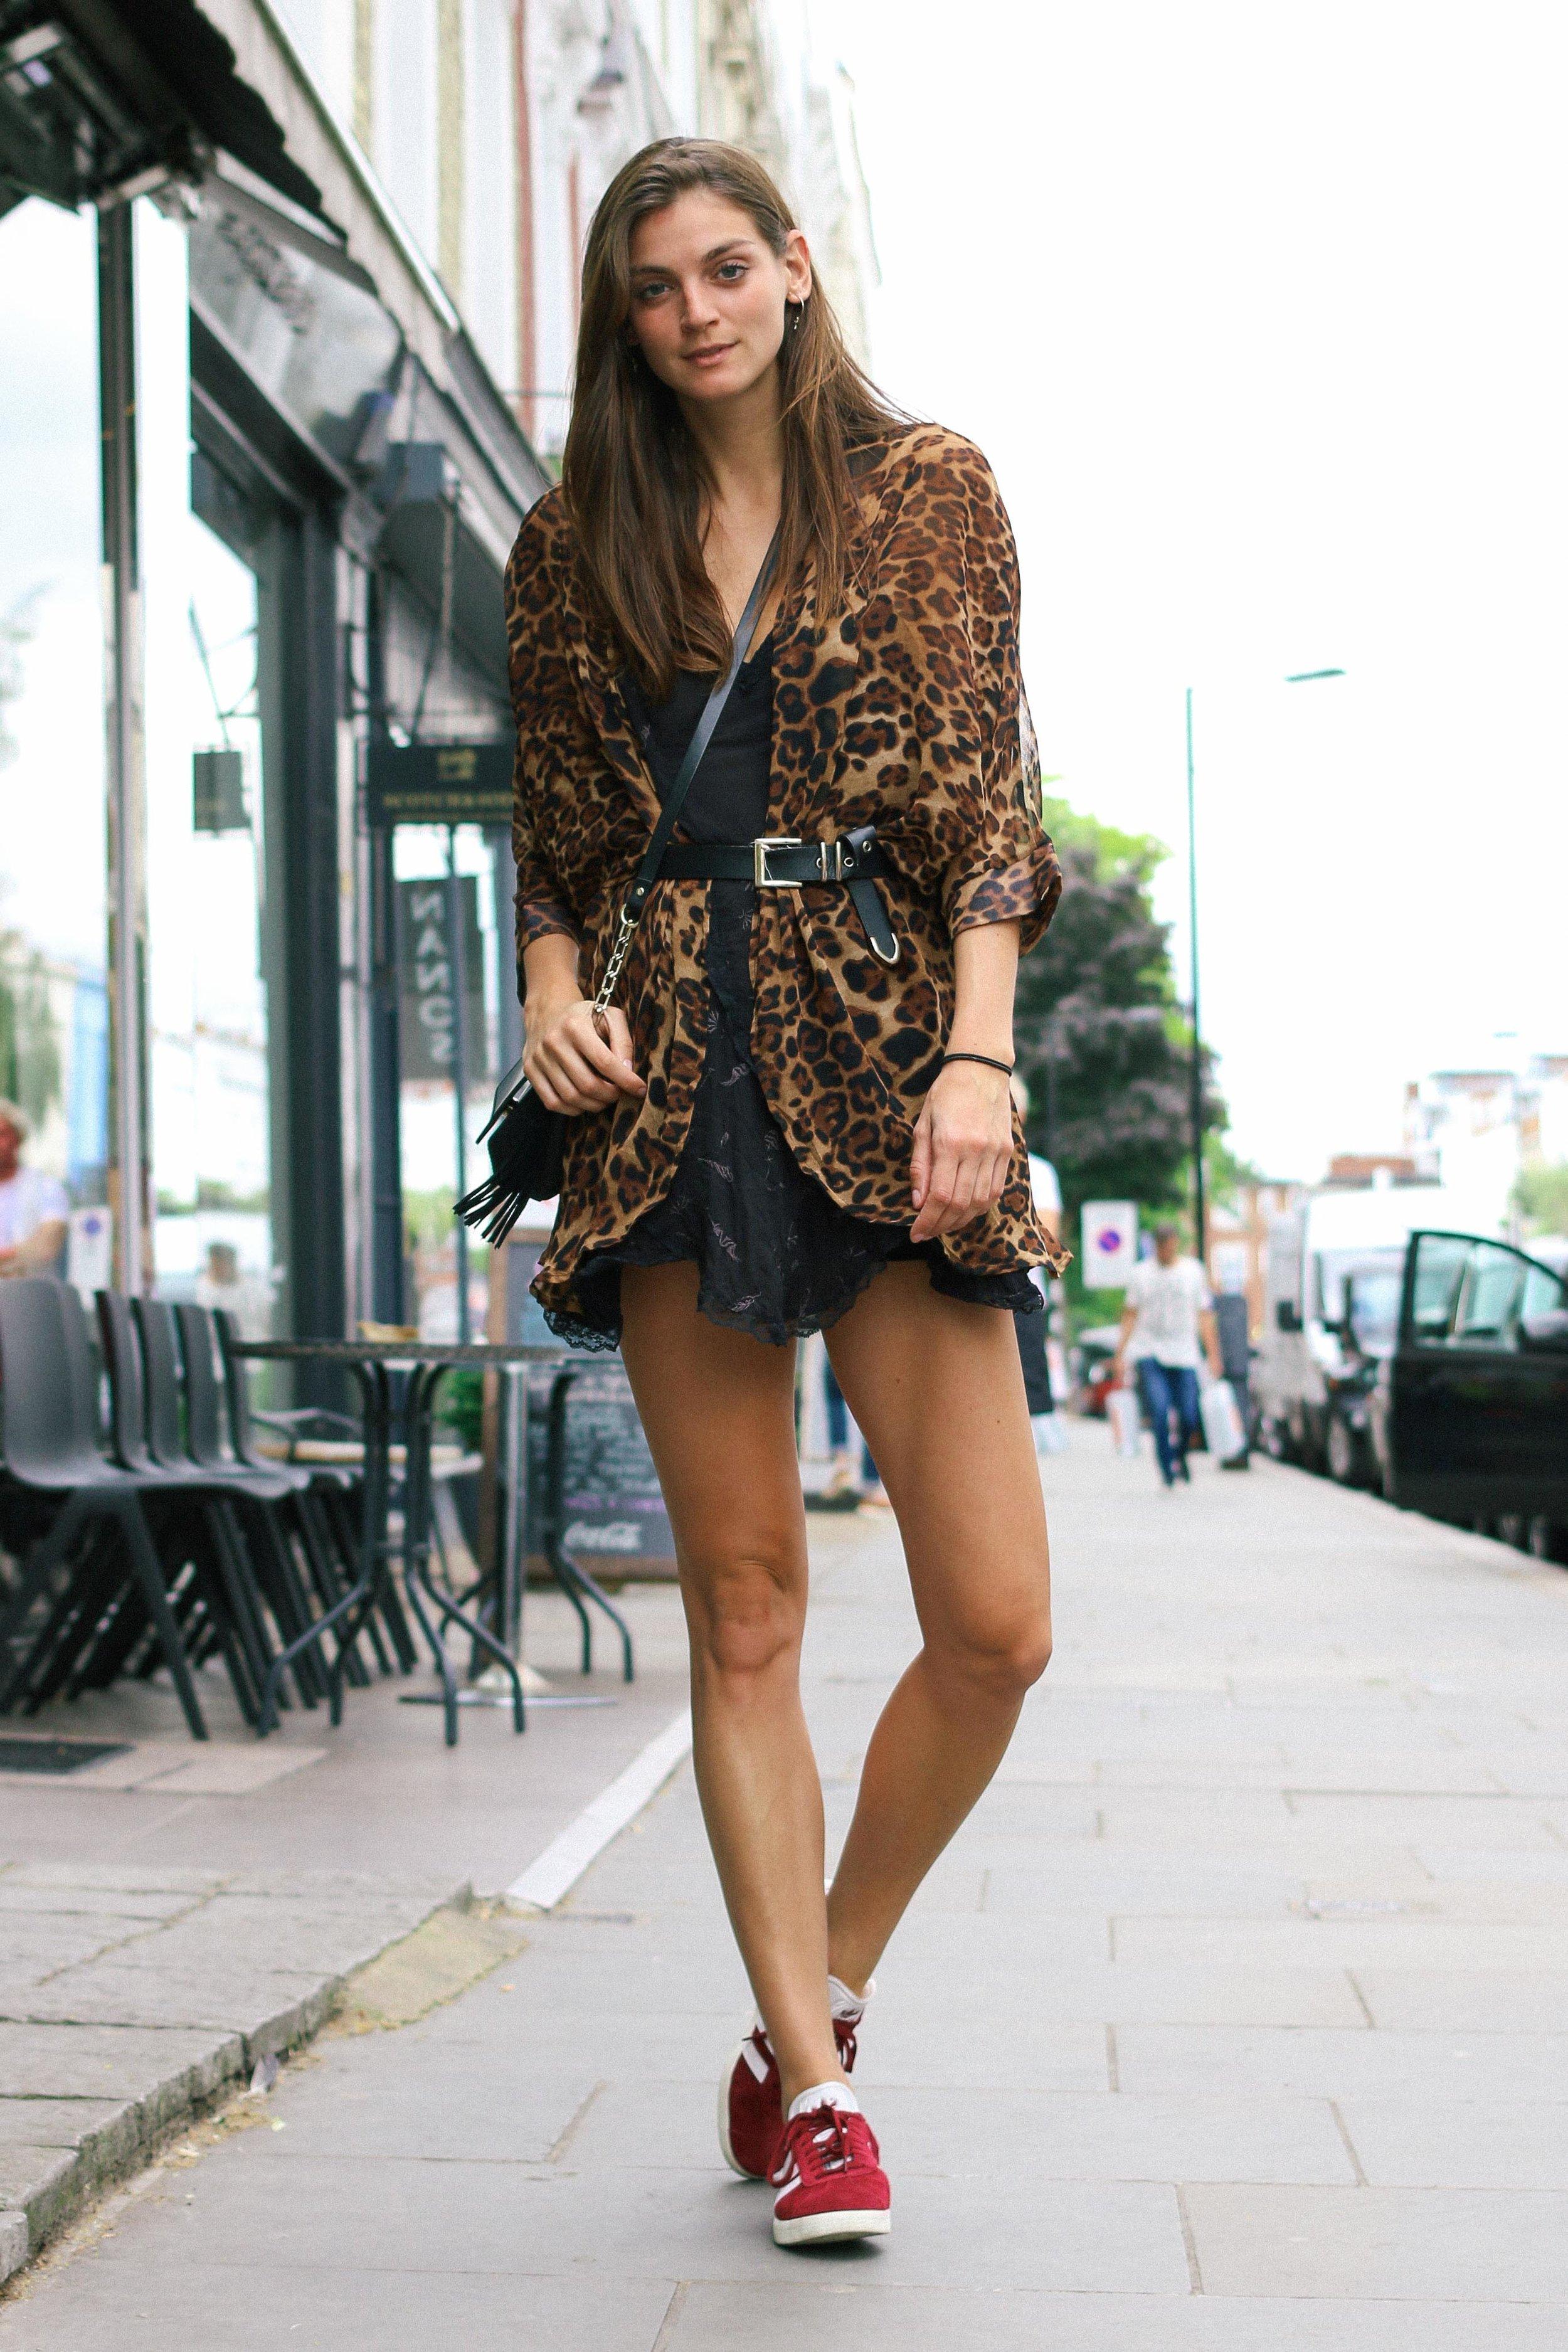 Street fashion stories_Imaginealady_alexa_corlett